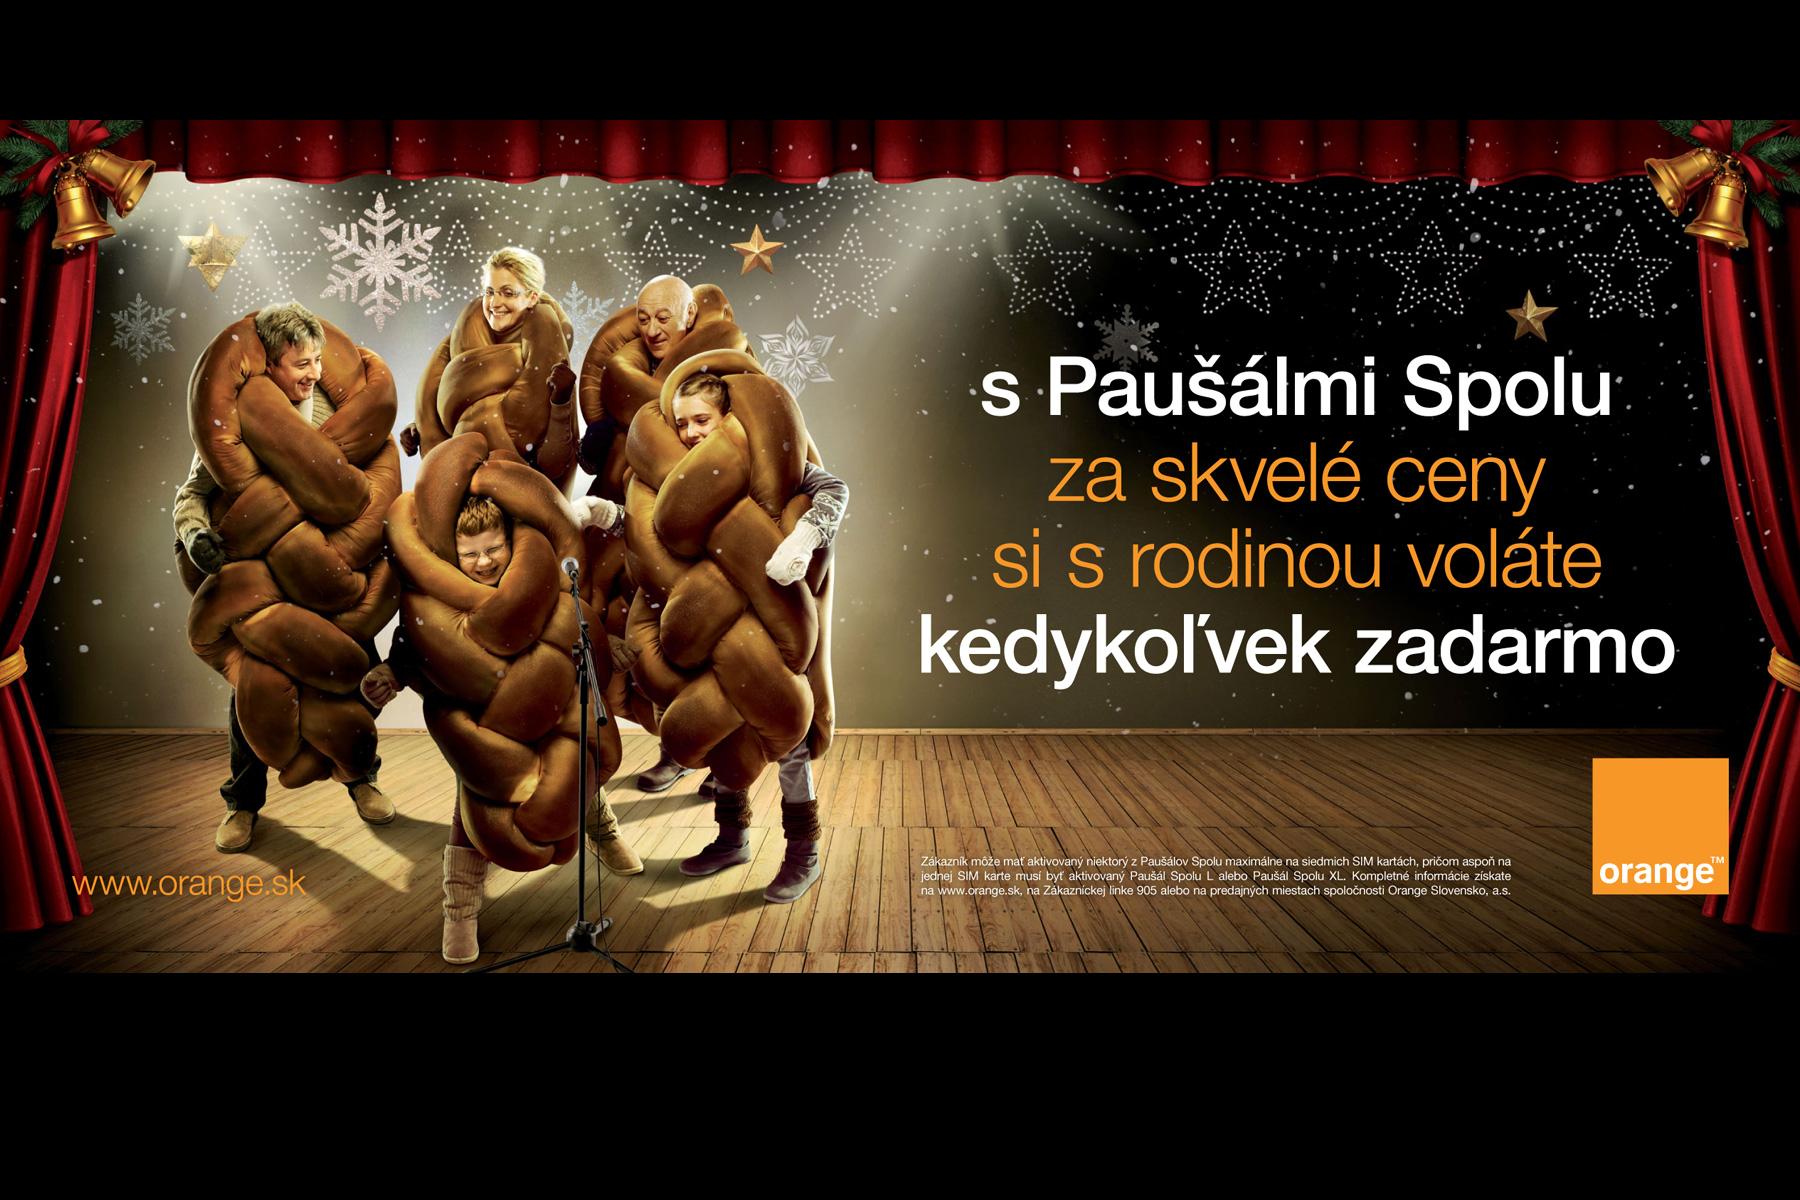 Martin Vrabko Advertising 05